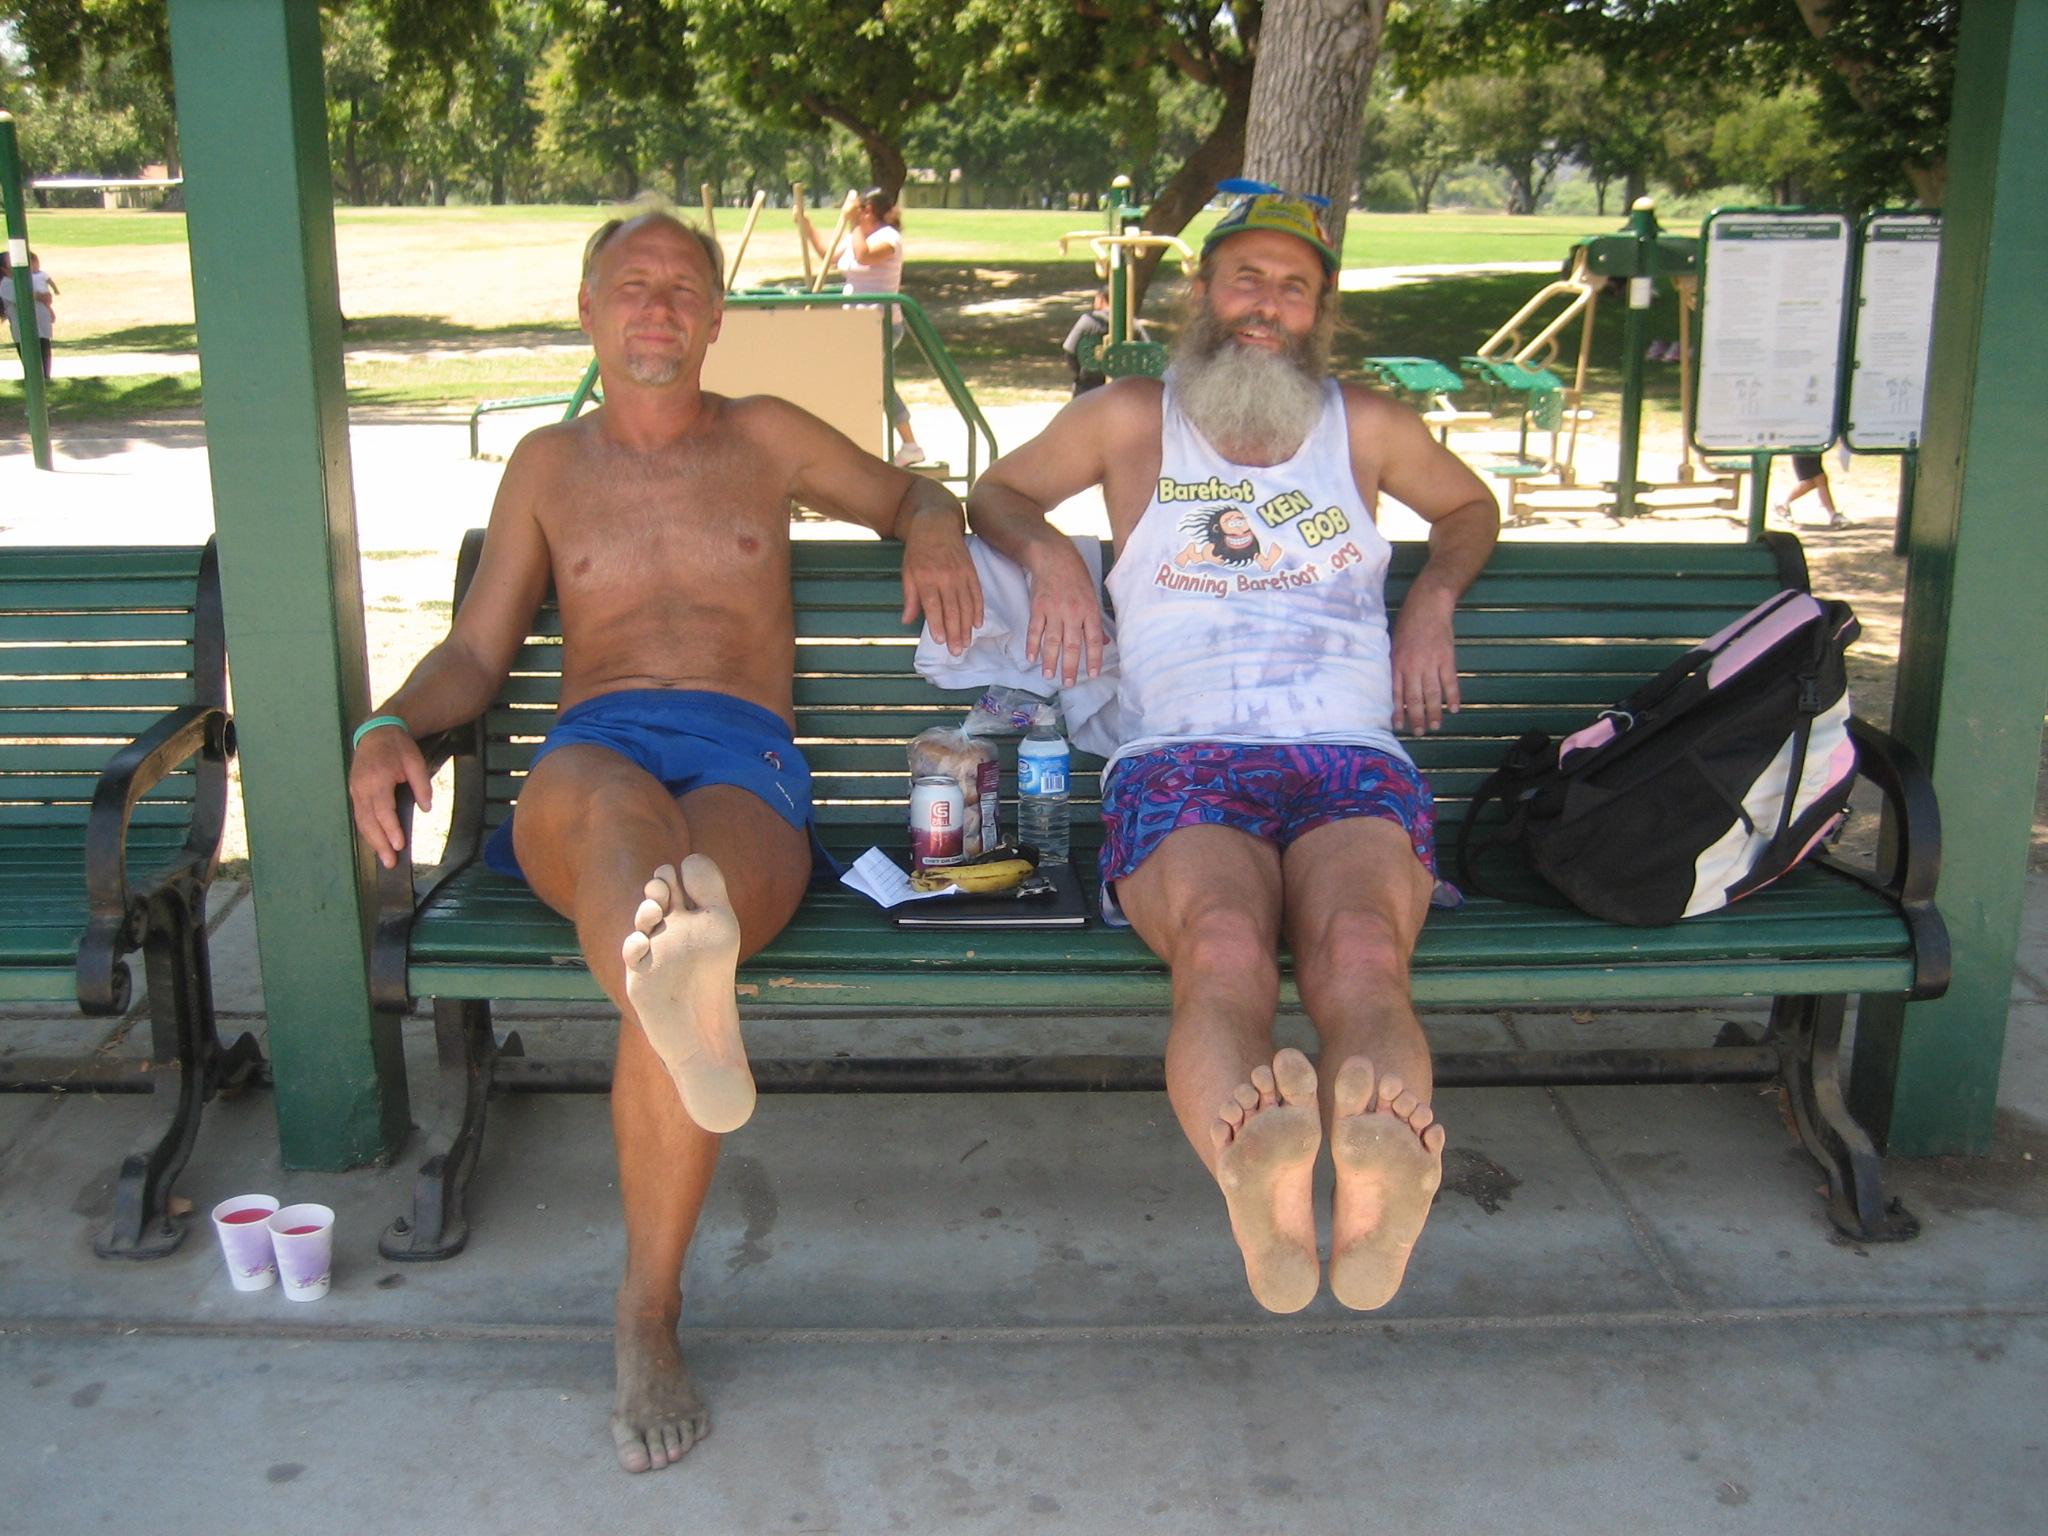 Todd and Ken Bob's soles 2009 June 28 Legg Lake Marathon, El Monte CA